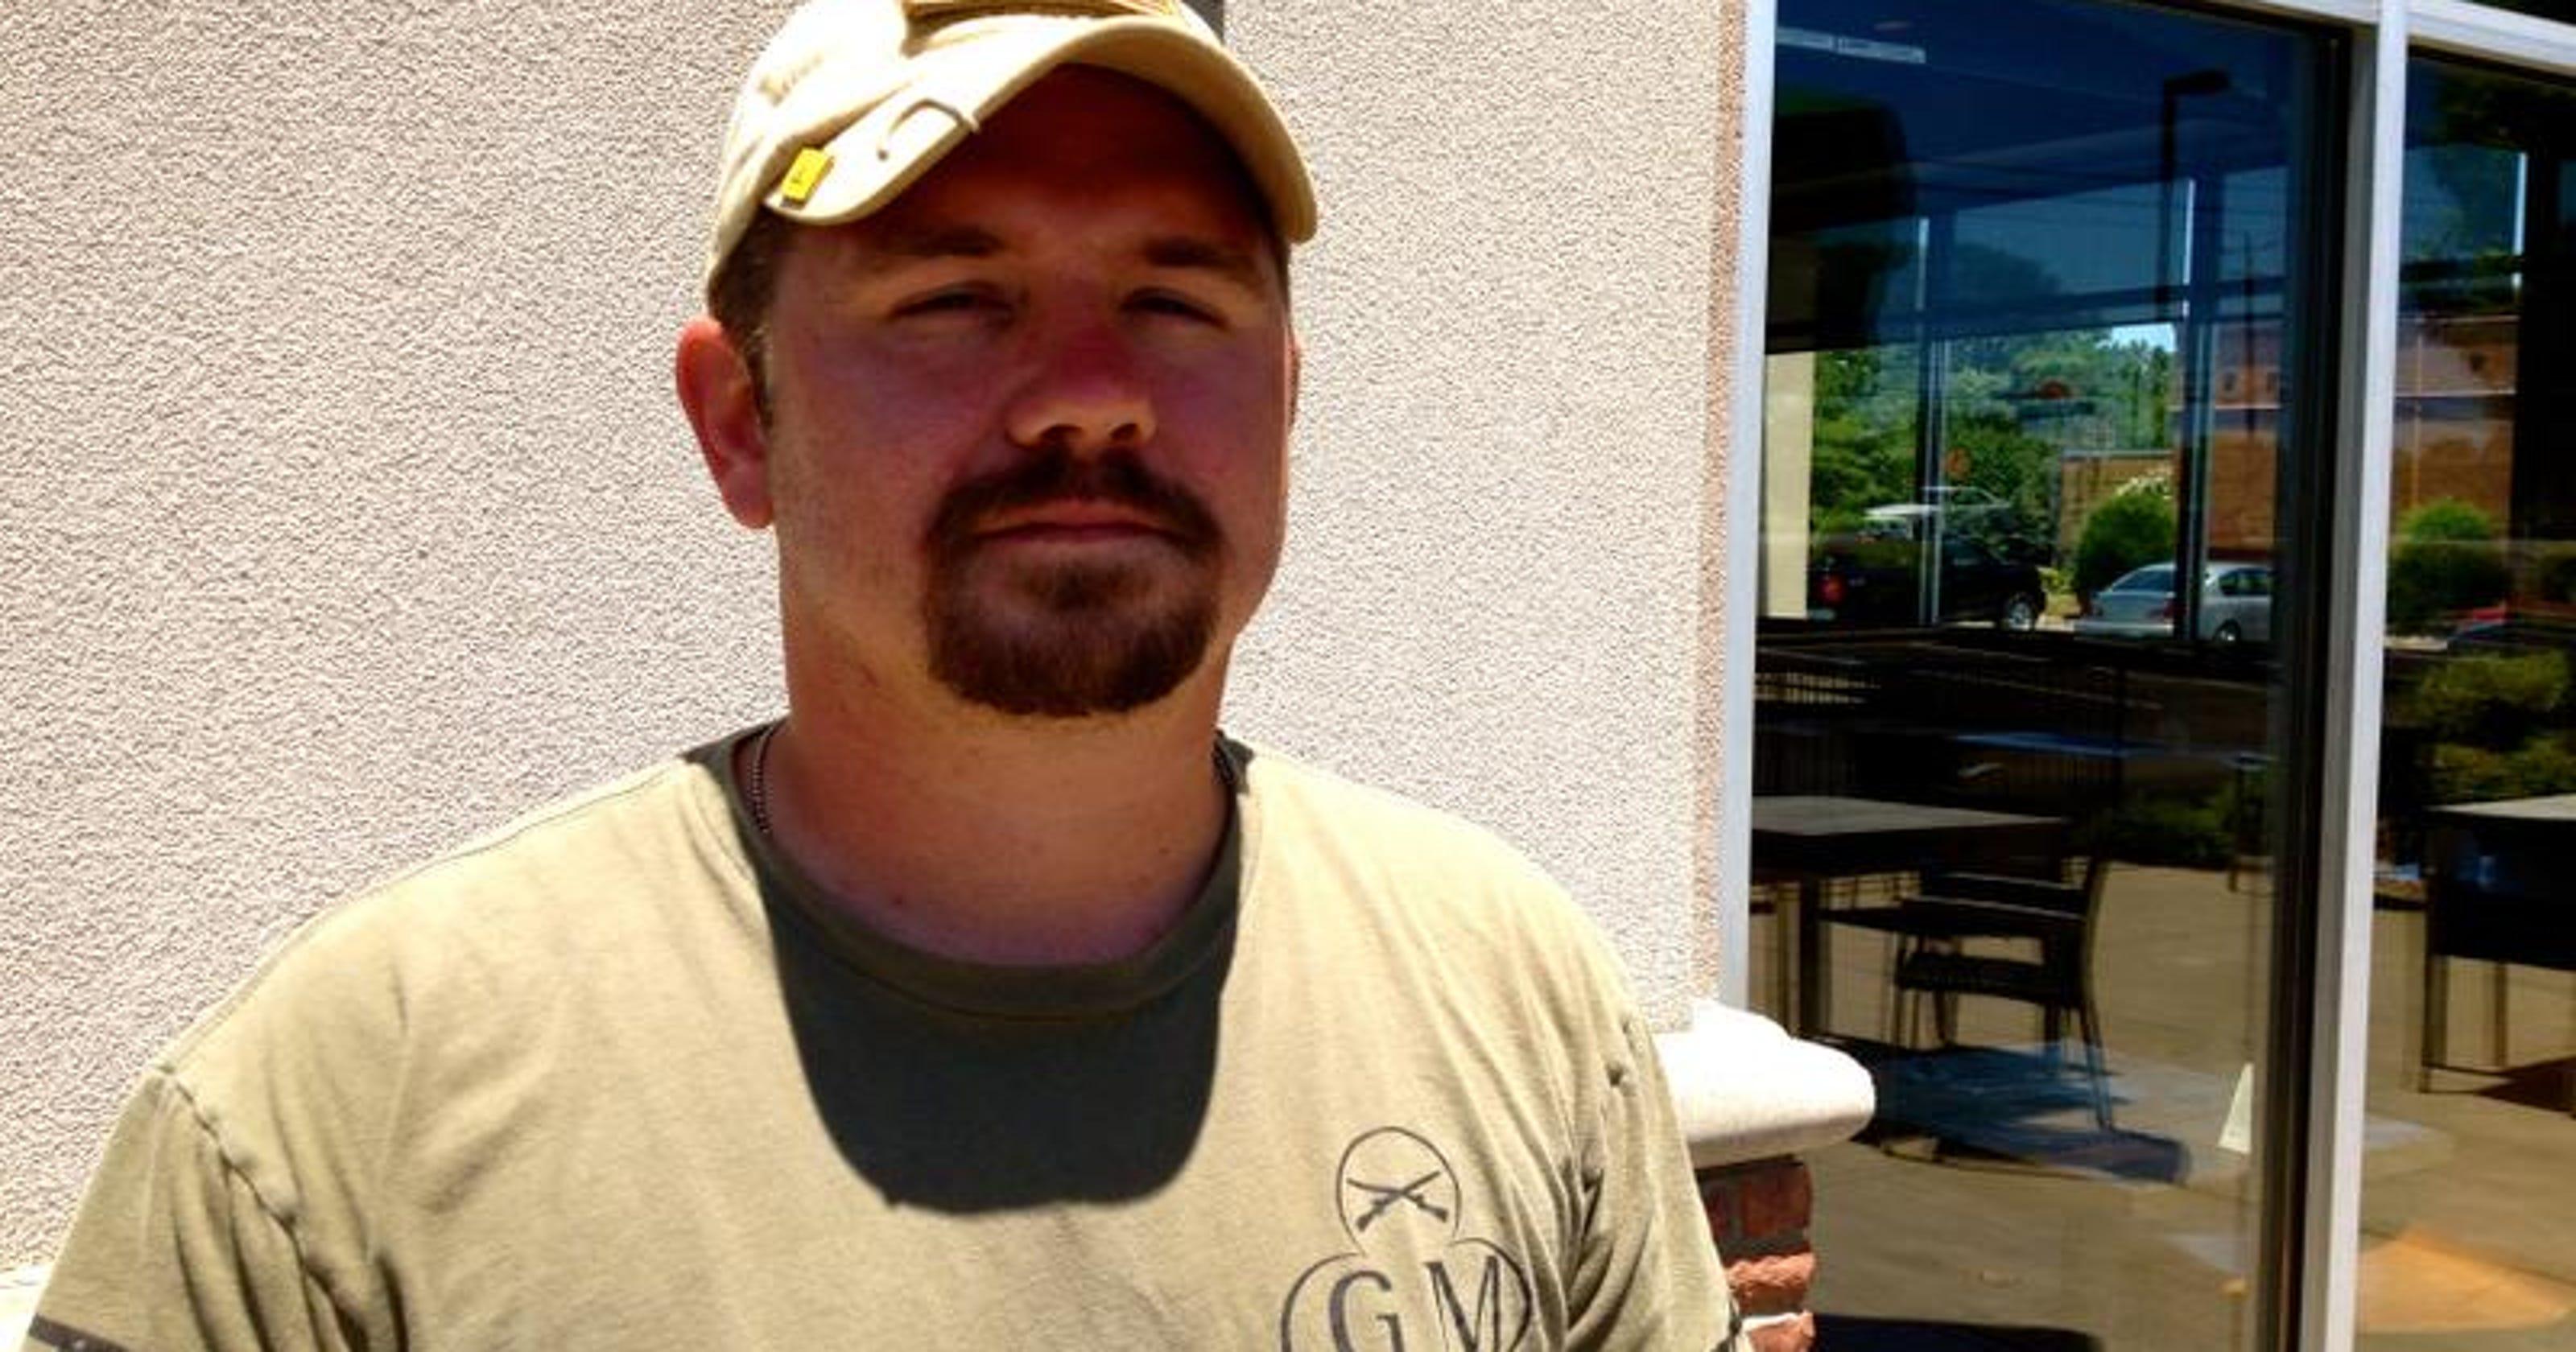 clarksville vet opens online shop offering military grade equipment